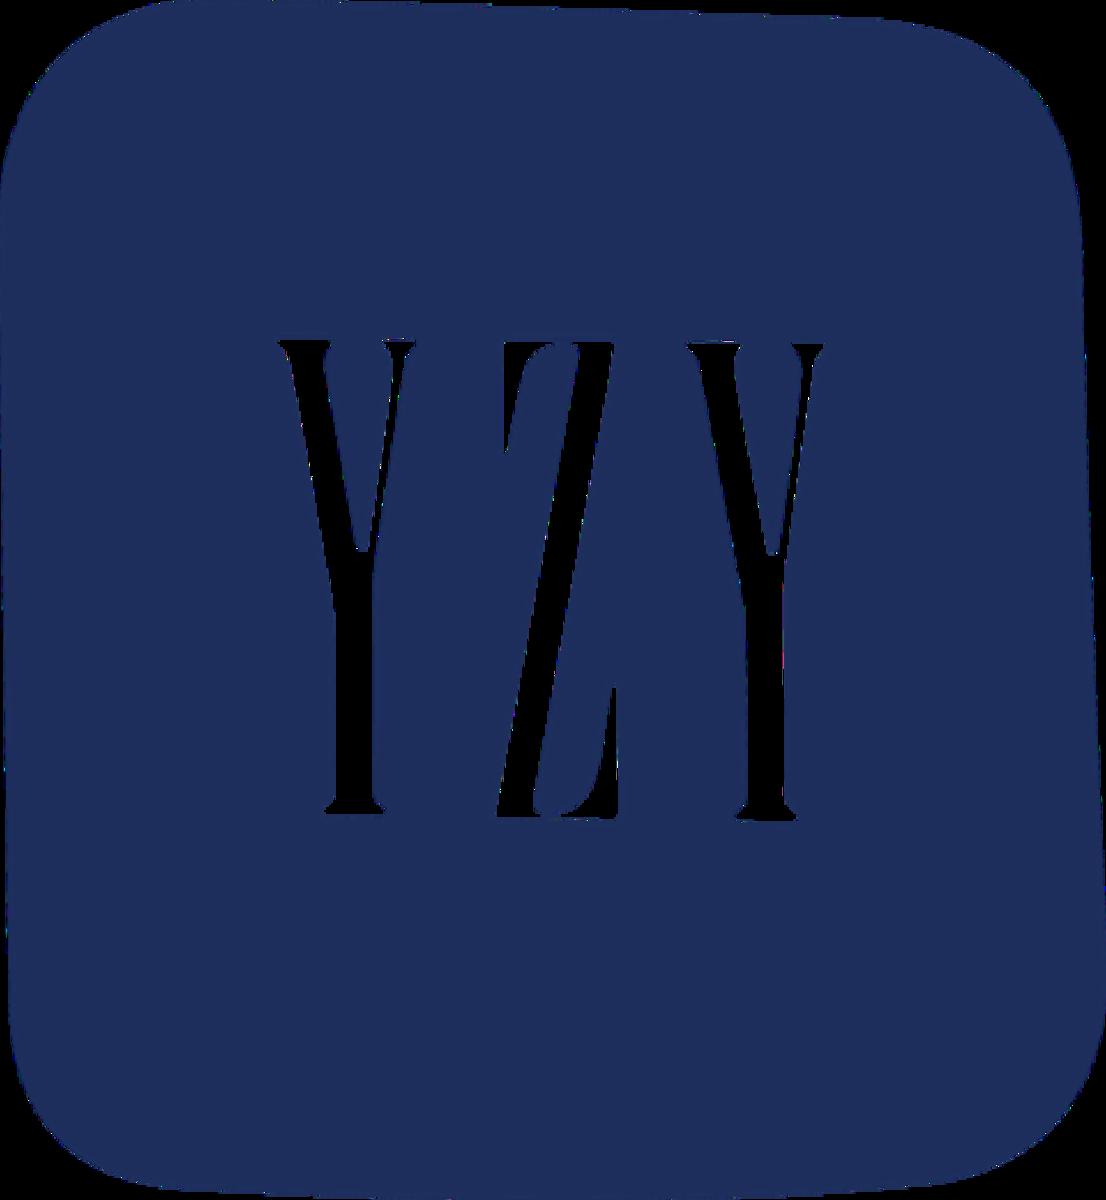 The new Yeezy Gap logo.